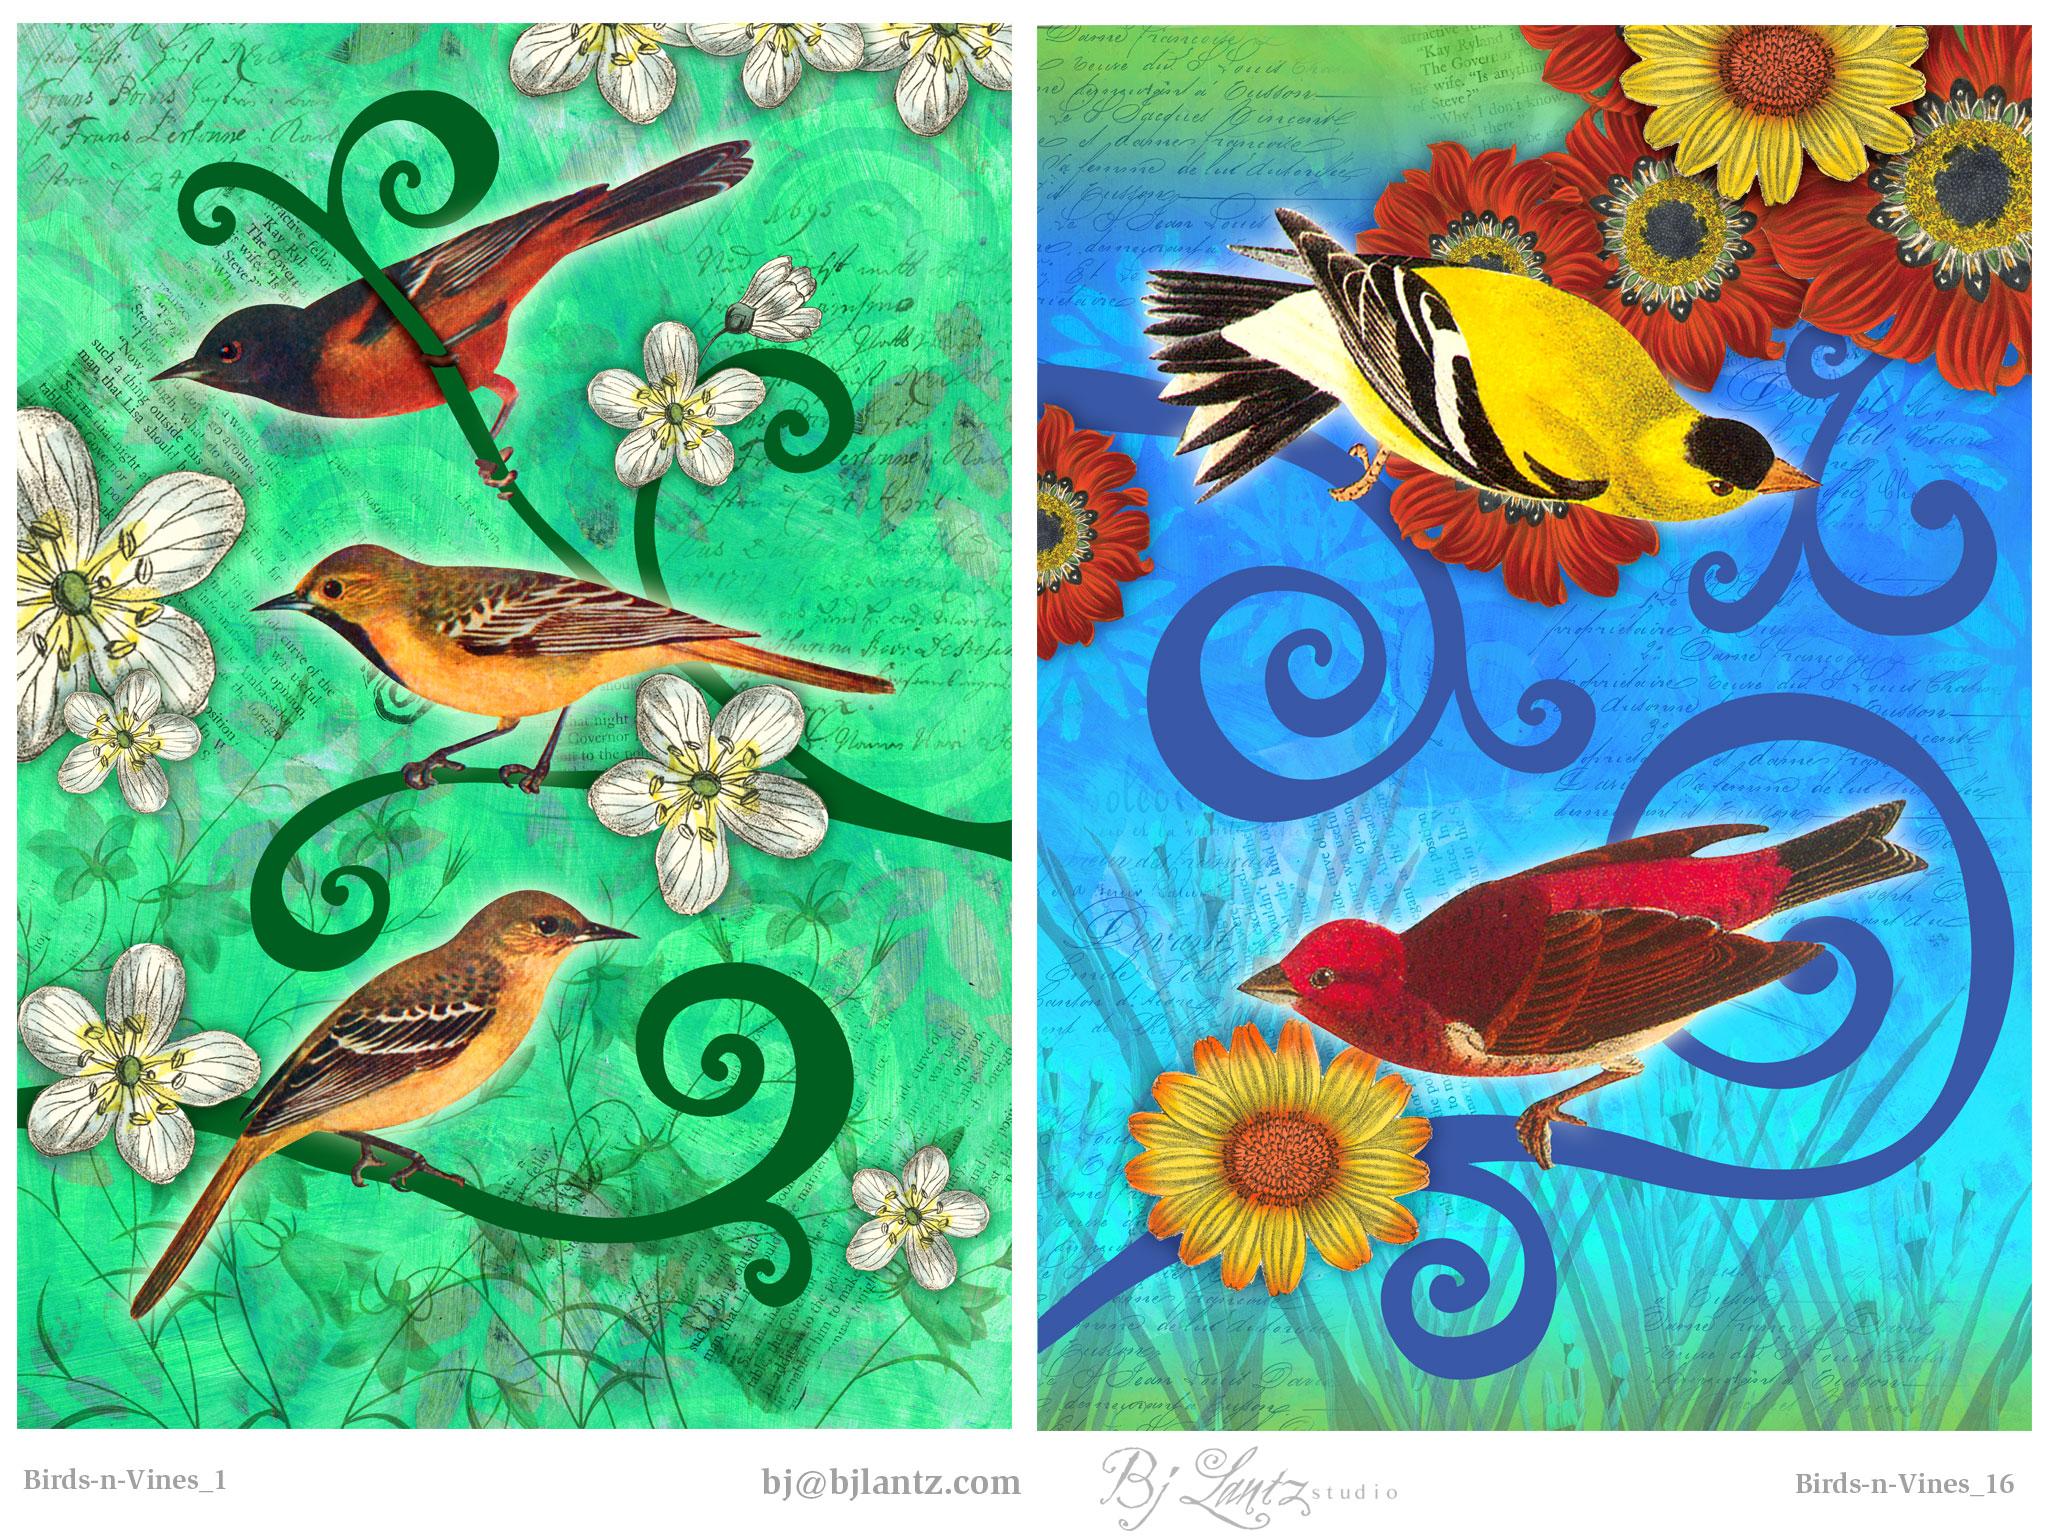 Birds-n-Vines_BJLantz_7.jpg